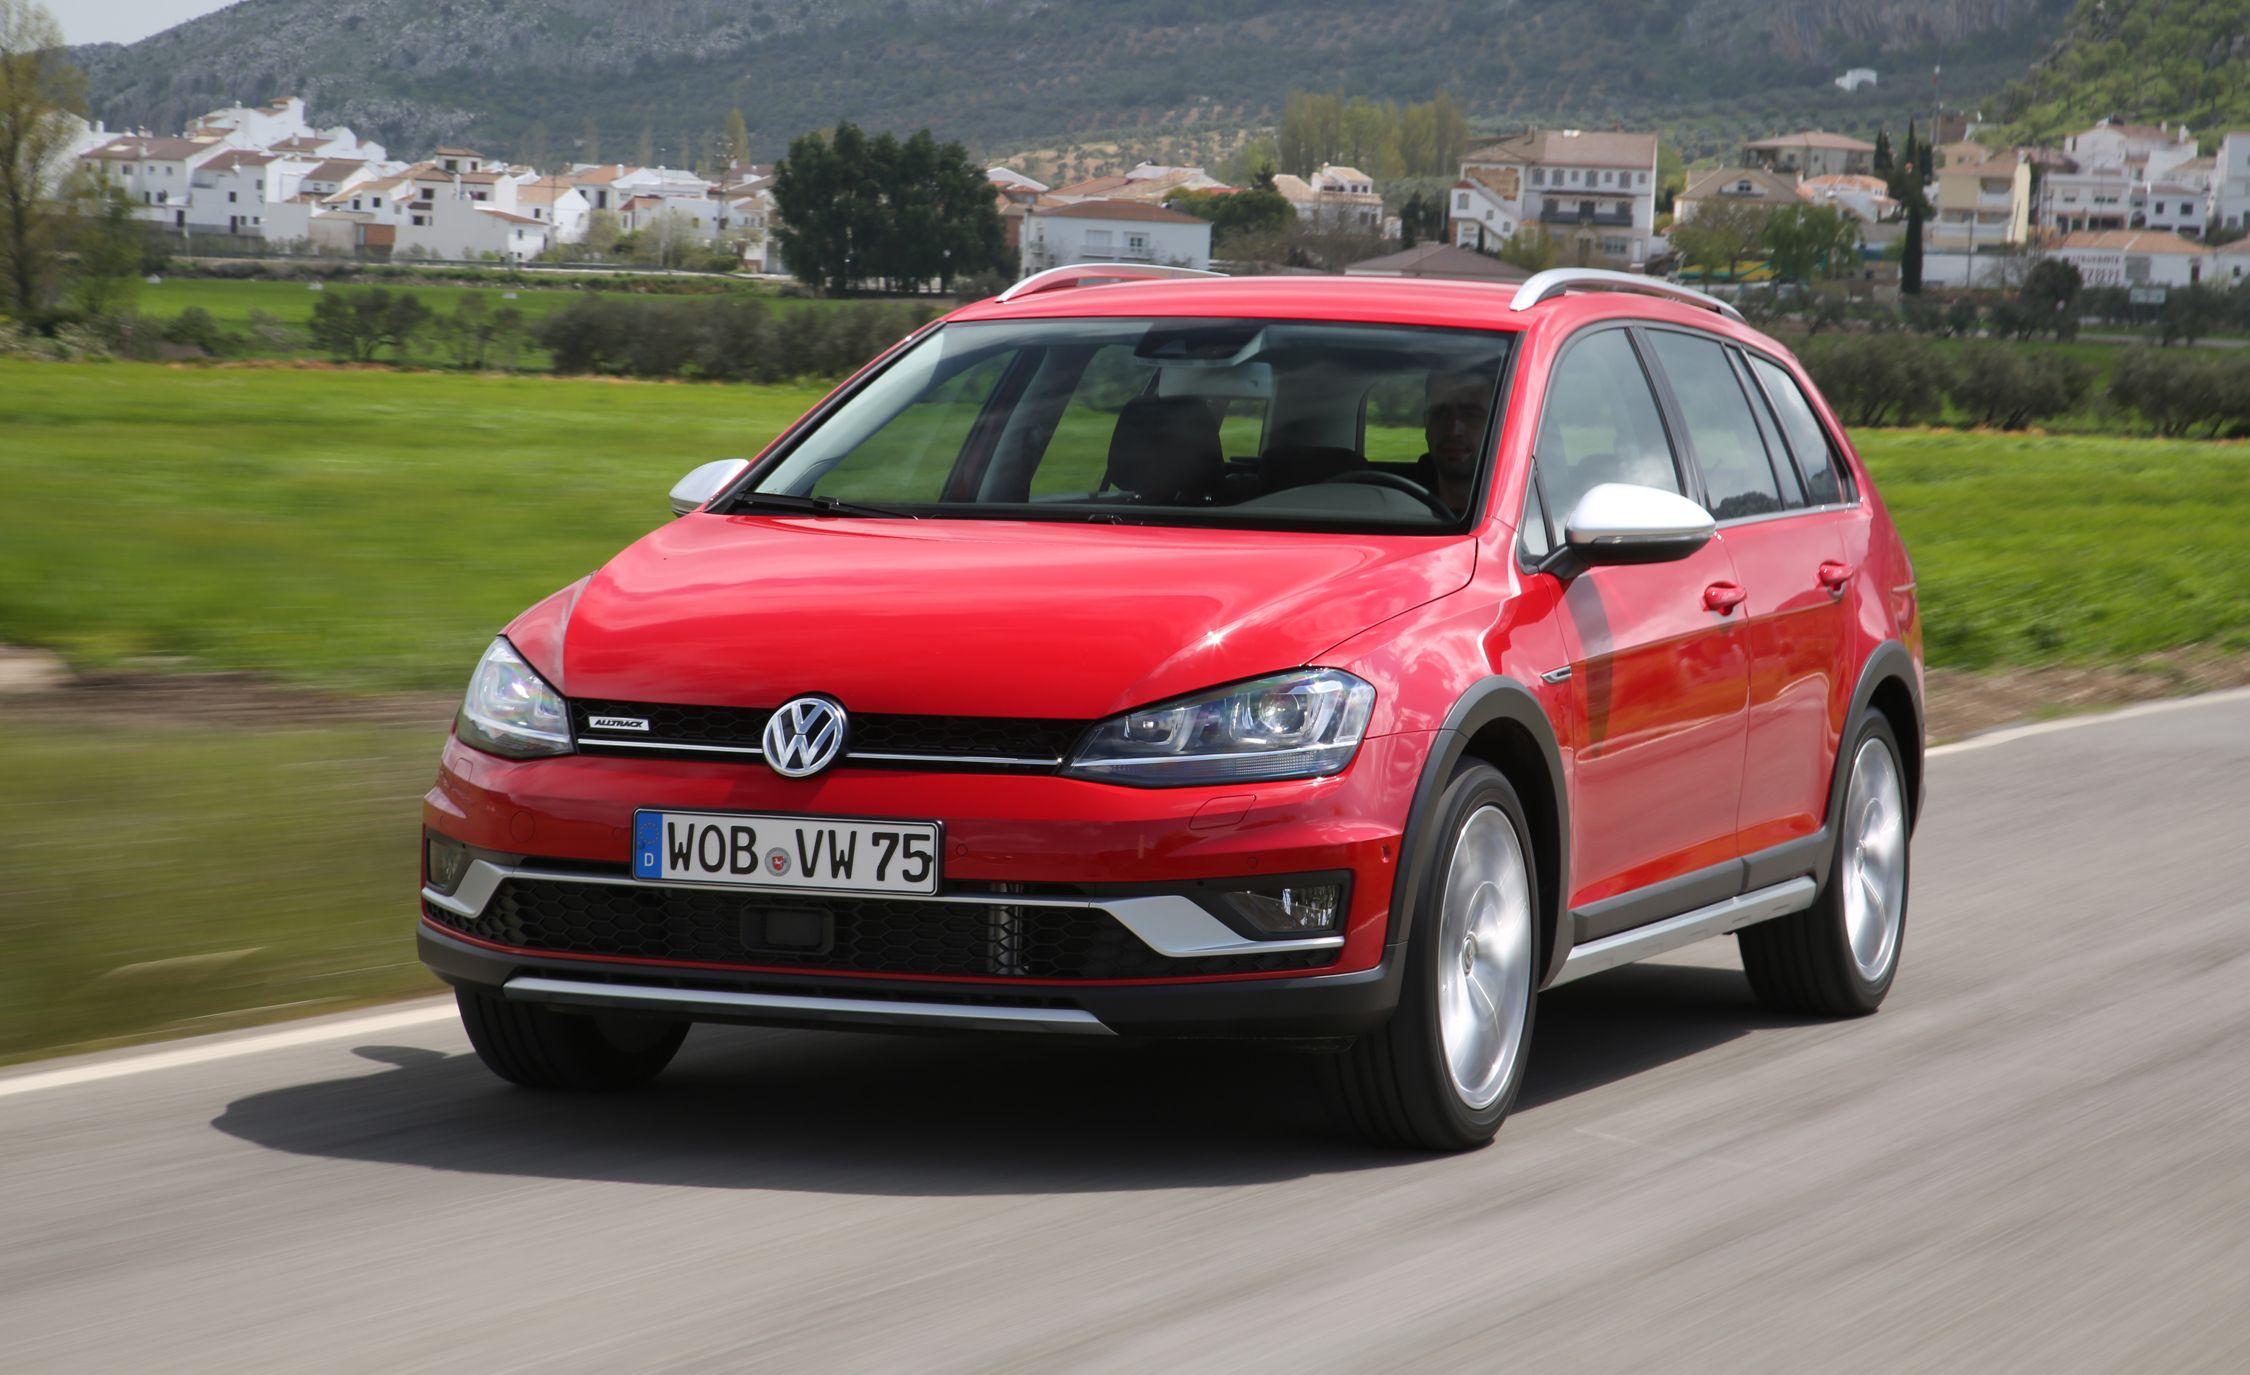 2017 vw golf sportwagen alltrack first drive review car and driver 2017 volkswagen golf sportwagen alltrack sciox Gallery